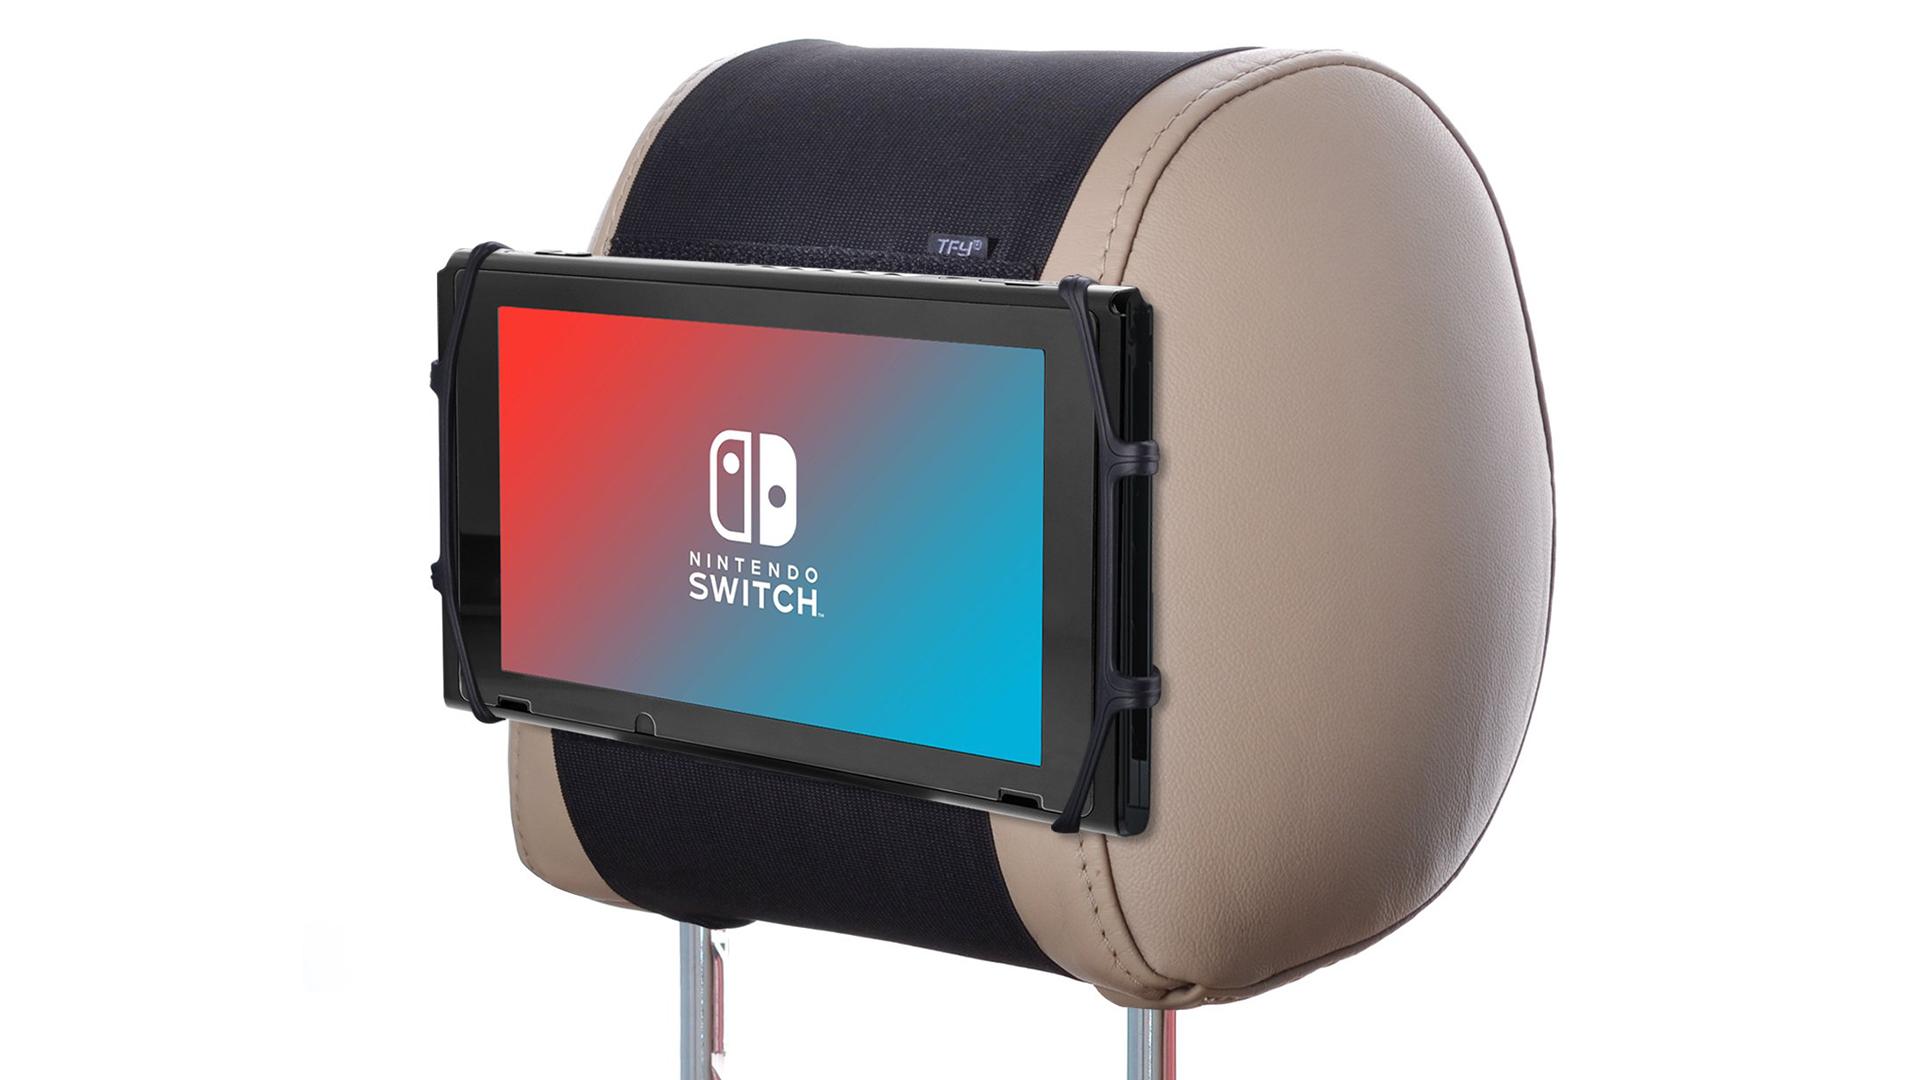 Nintendo Switch Accessories Headrest Mount